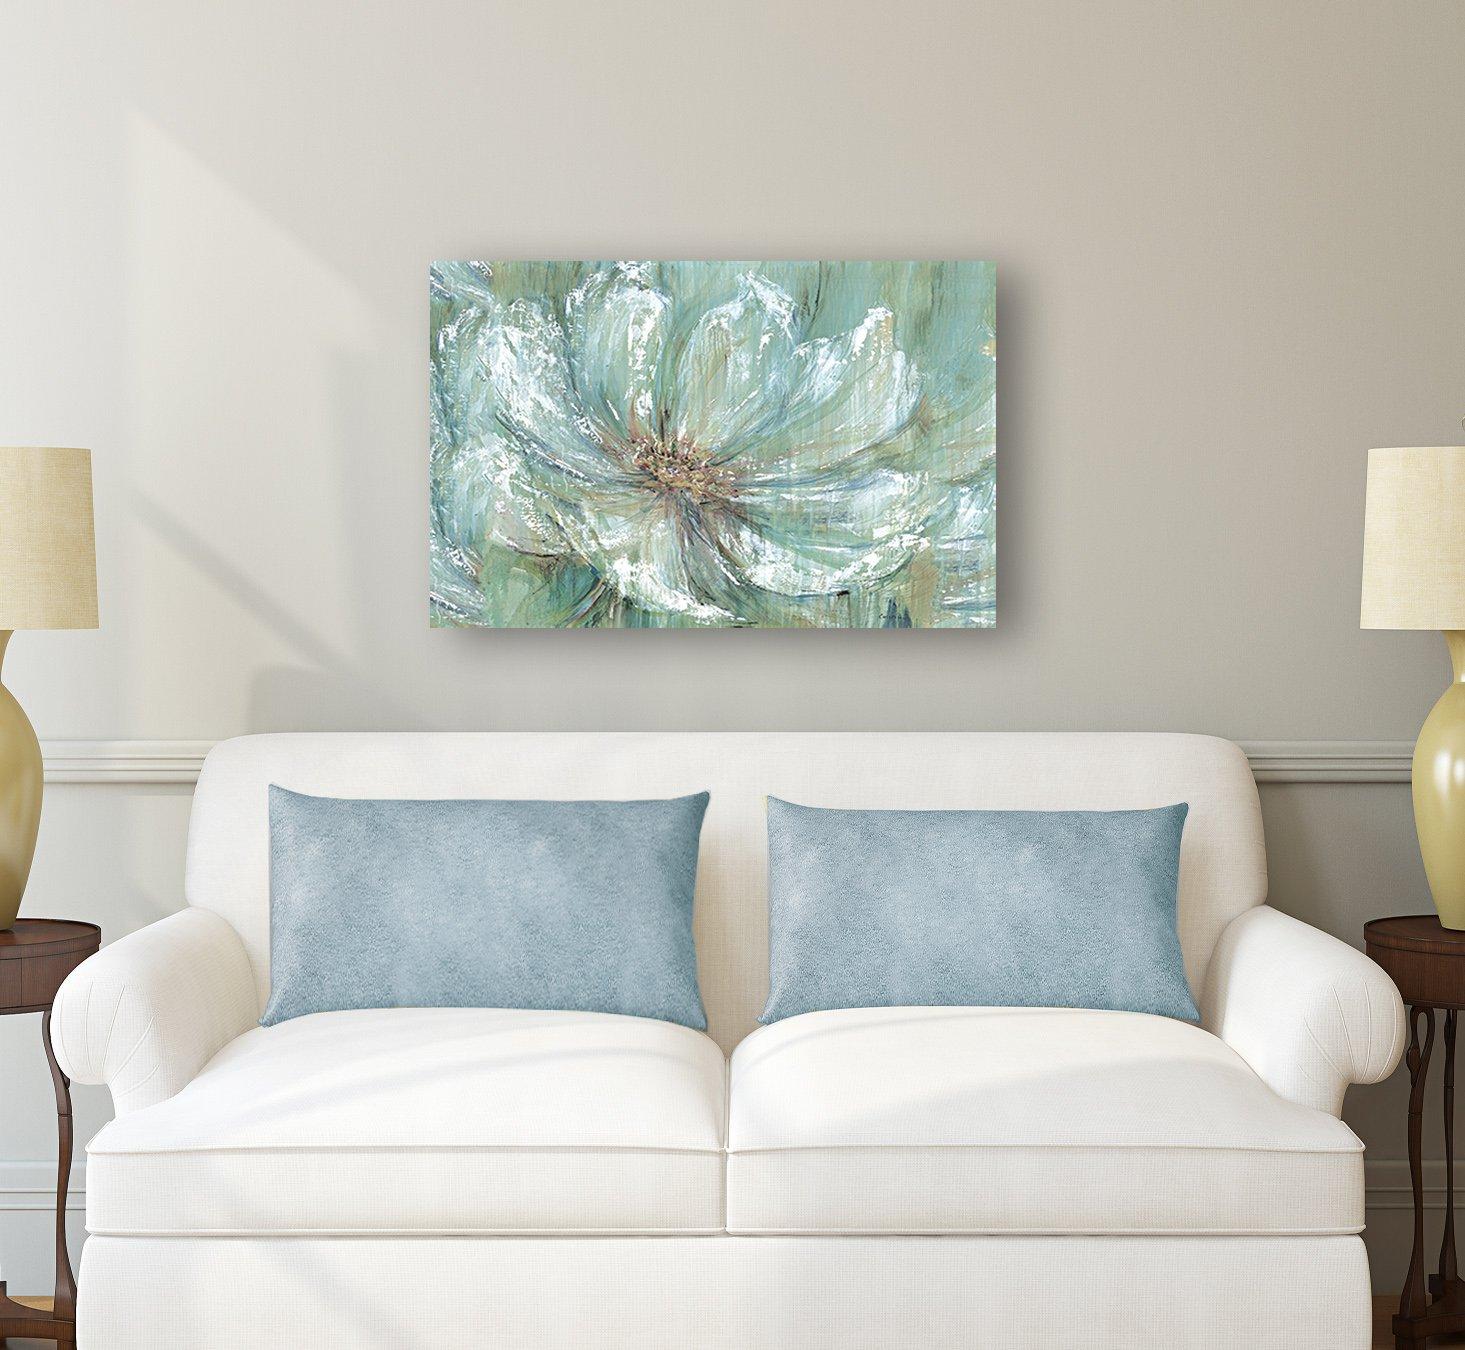 living room artwork decor. Amazon com  Portfolio Canvas Decor TEAL SPLASH by Carson Large Wall Art 24 x 36 Posters Prints